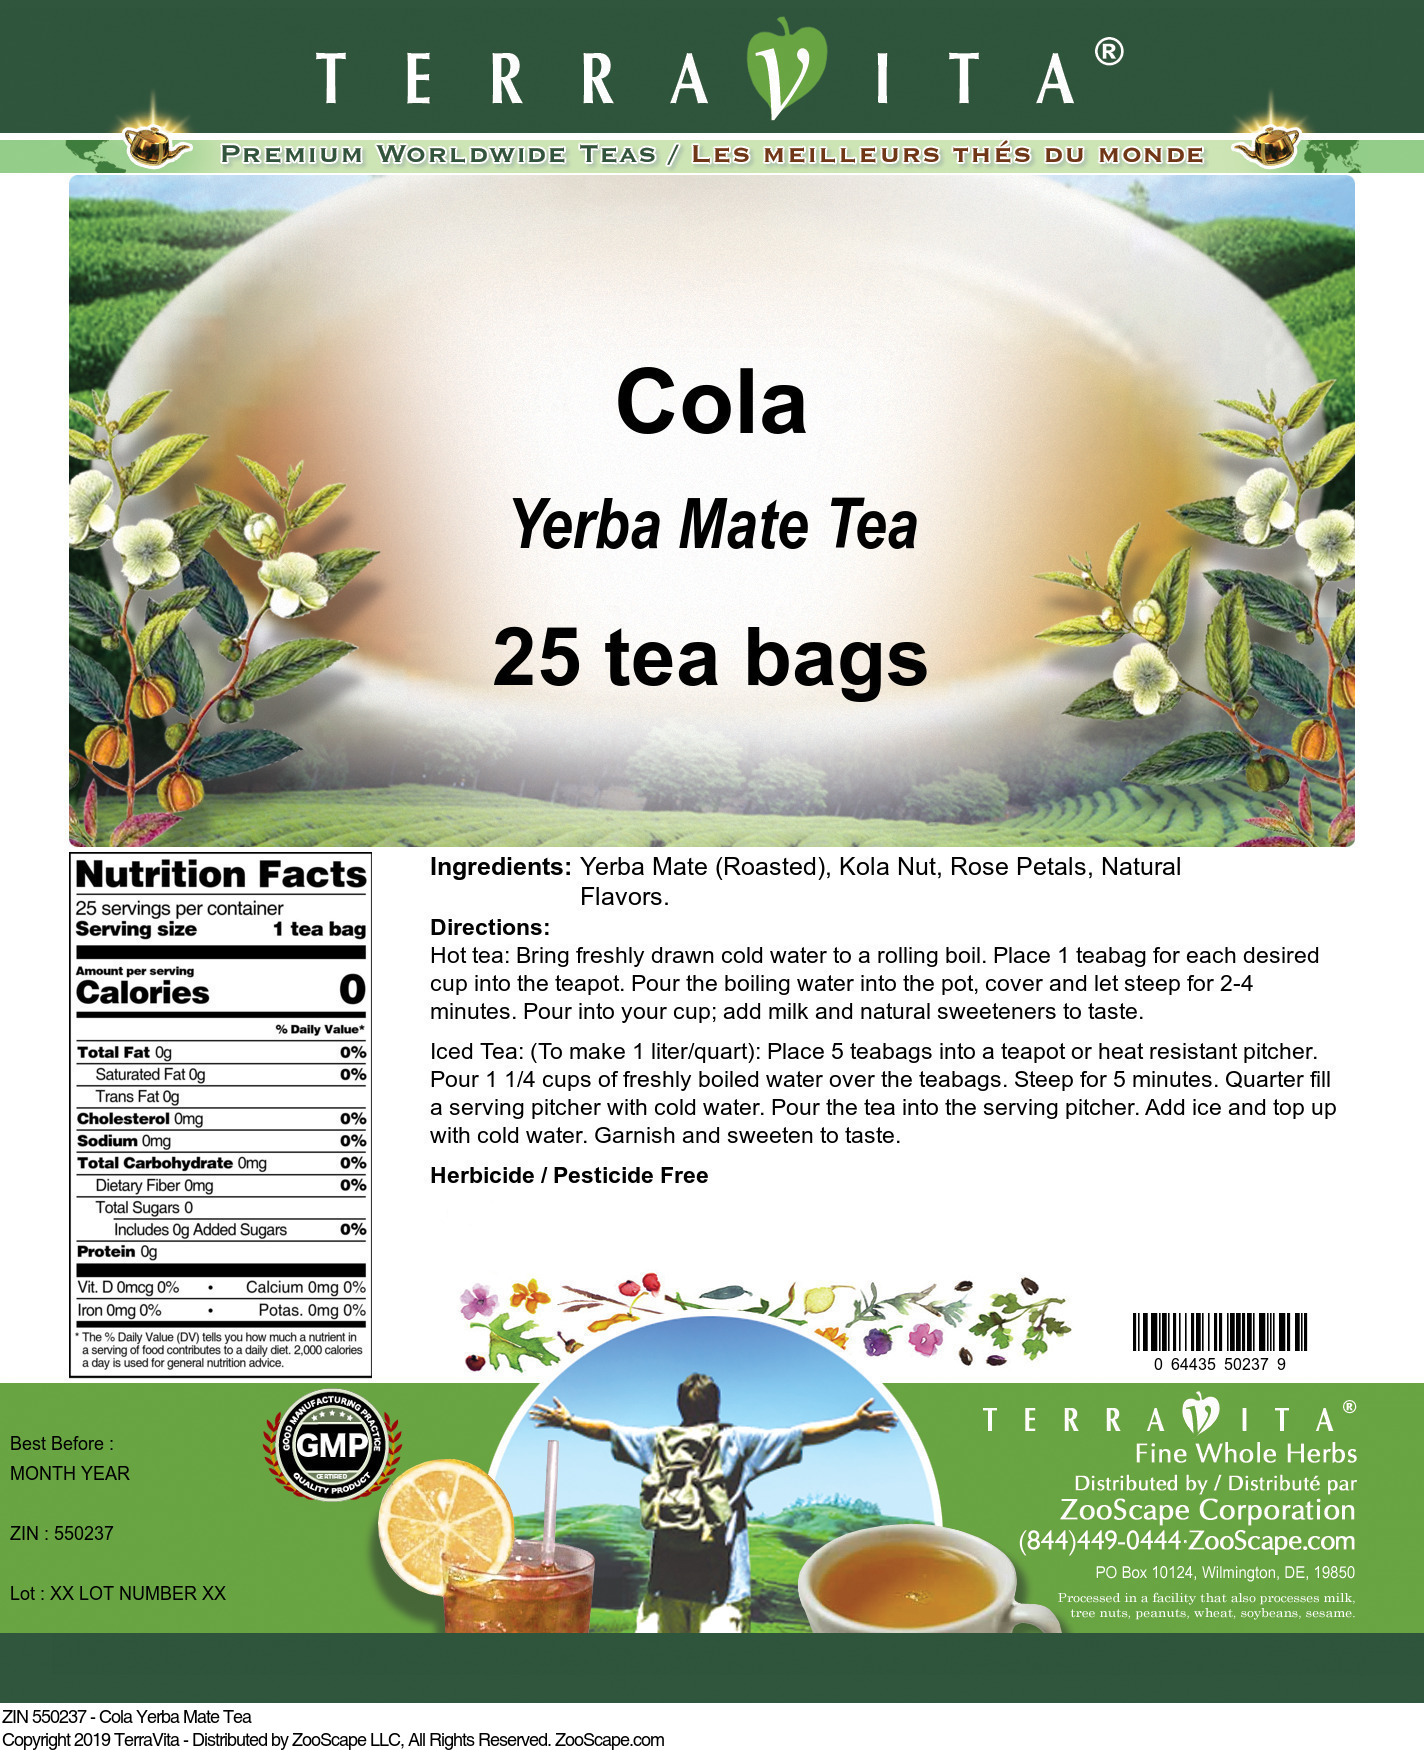 Cola Yerba Mate Tea